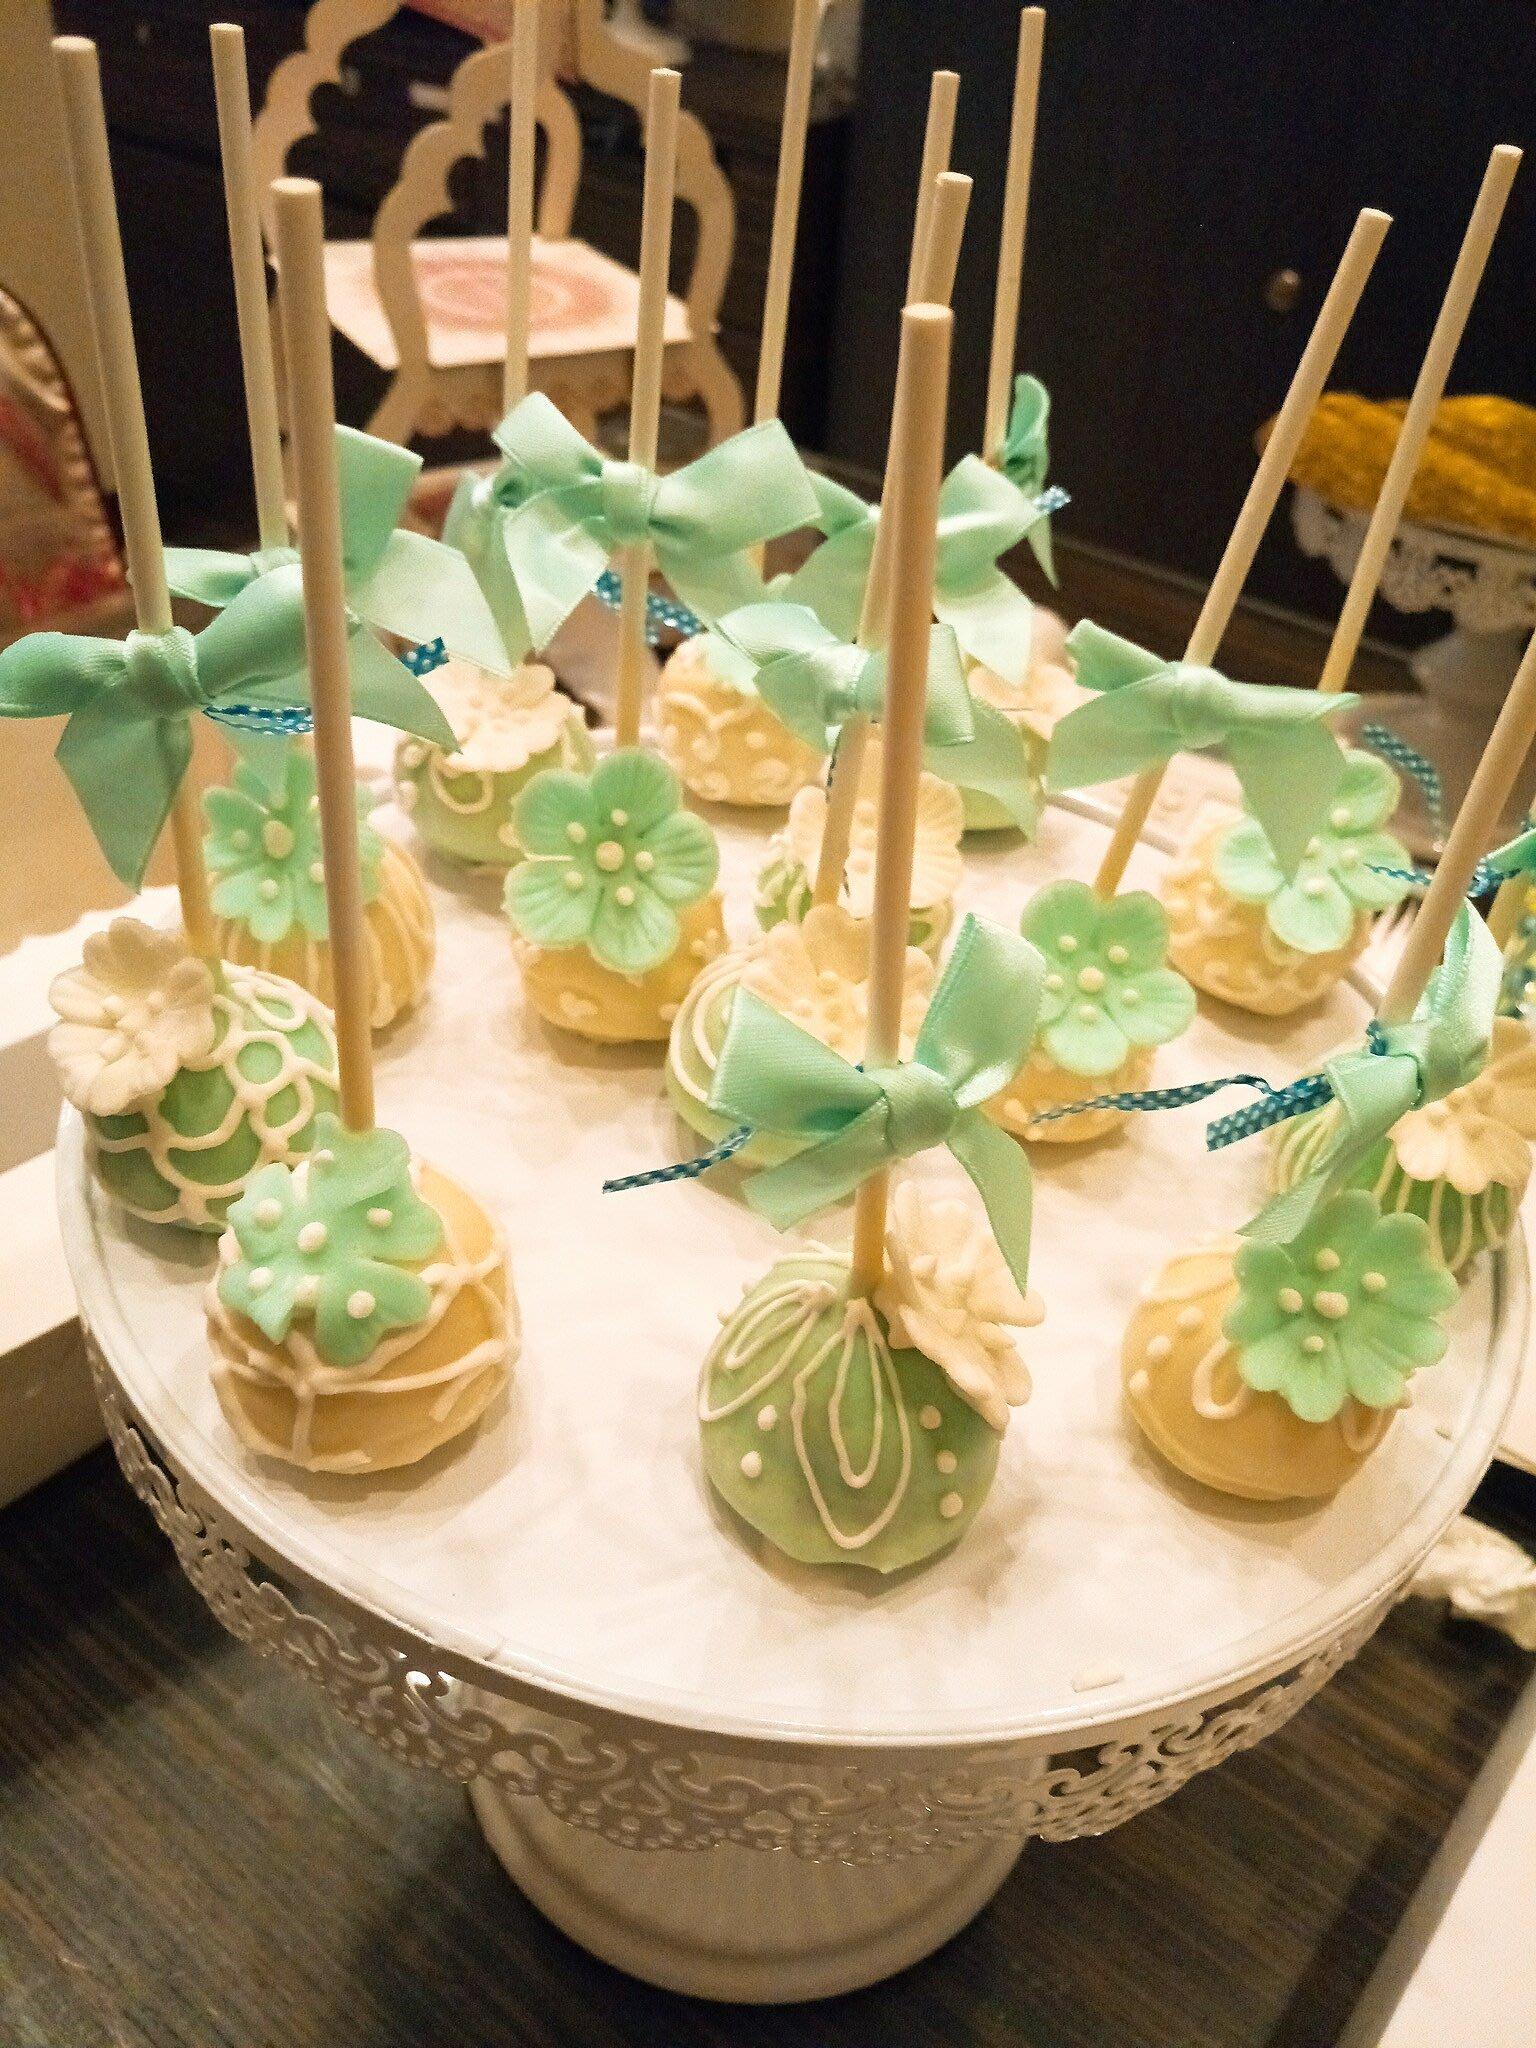 WeddingCake Candy Bar 50支組合 婚禮慶生派對棒棒糖蛋糕POP Cake 婚禮小物/二進小物